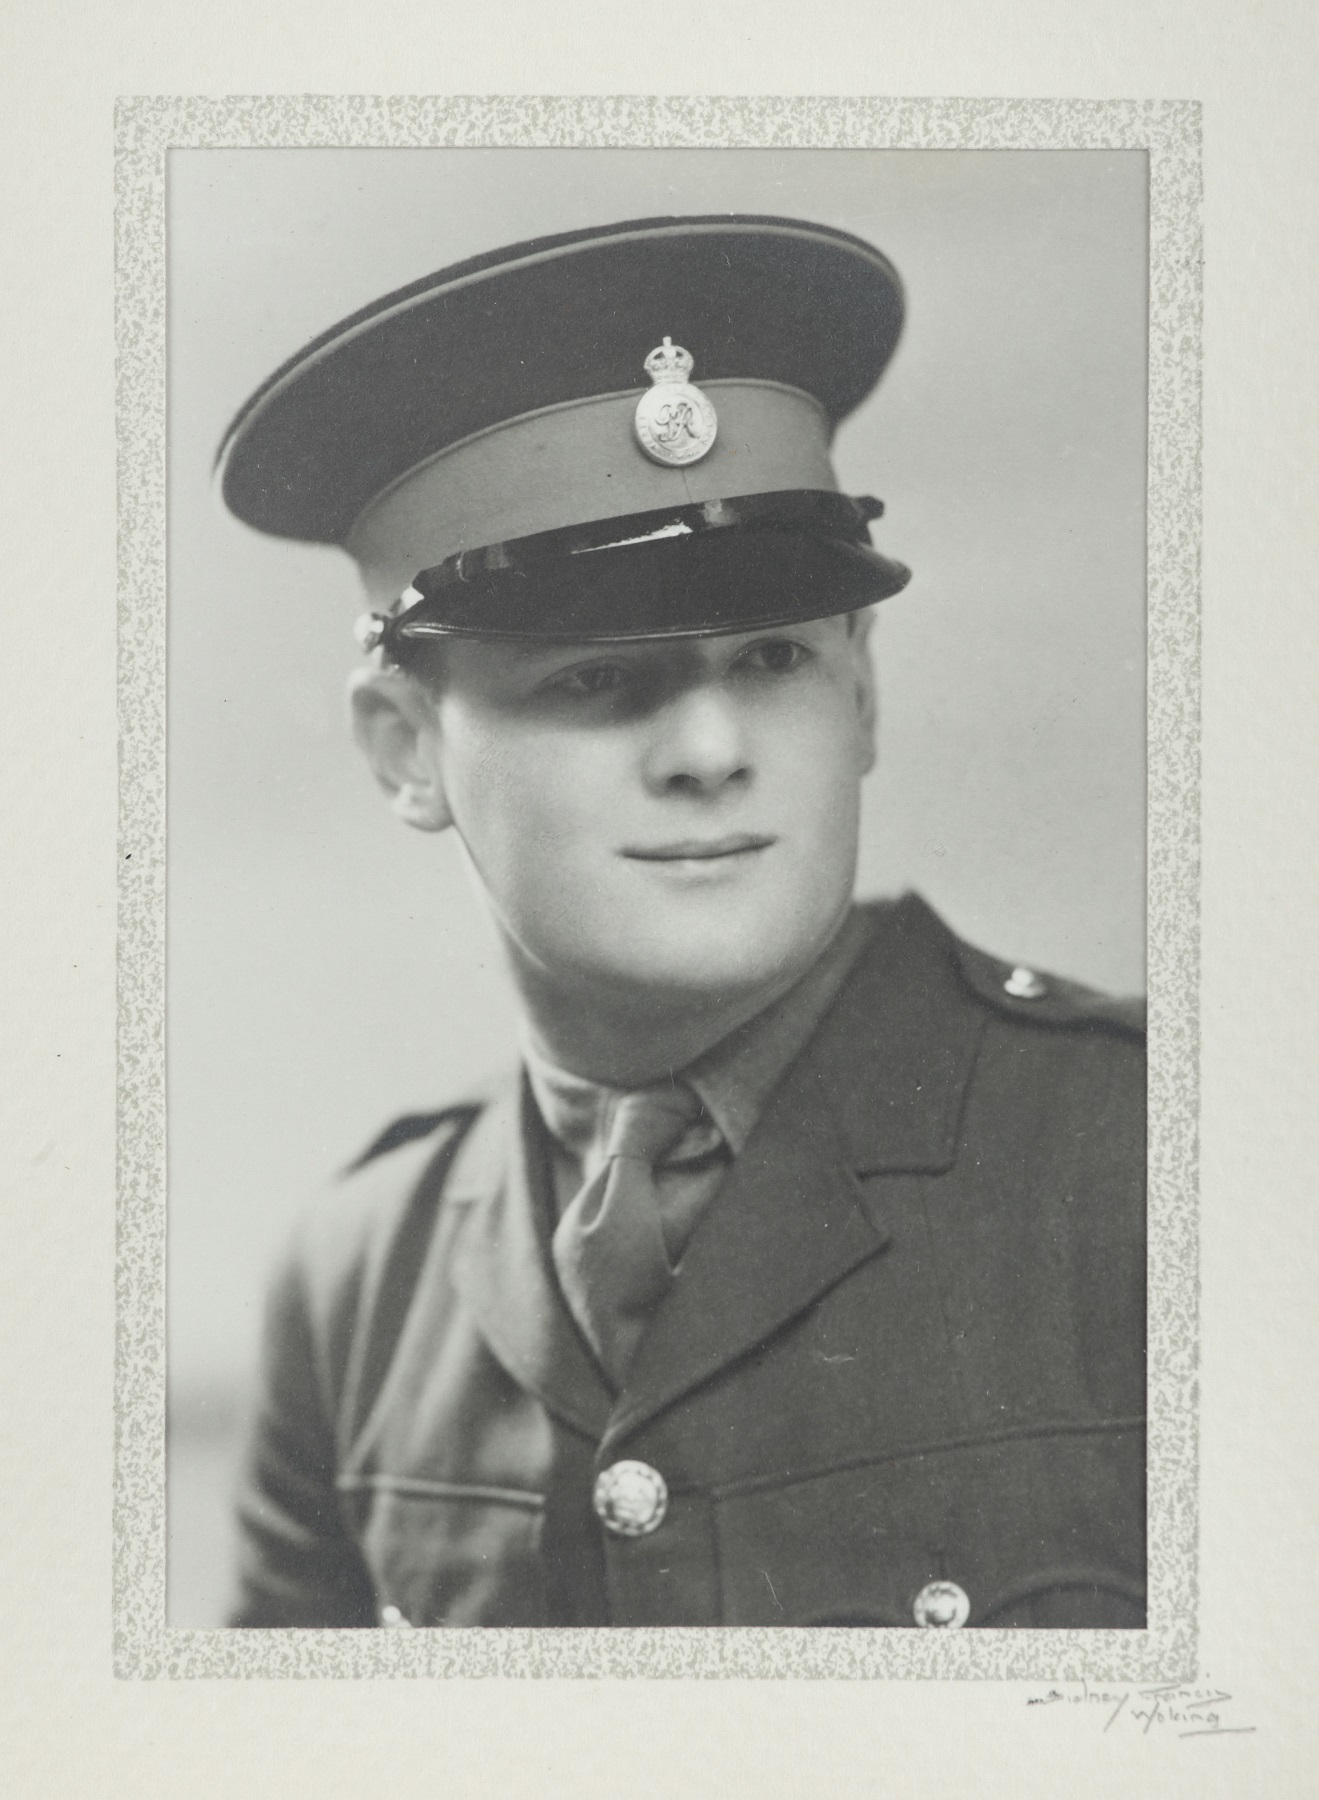 Photograph of Major Peter Killick in his uniform, c.1939-44, artist unknown.